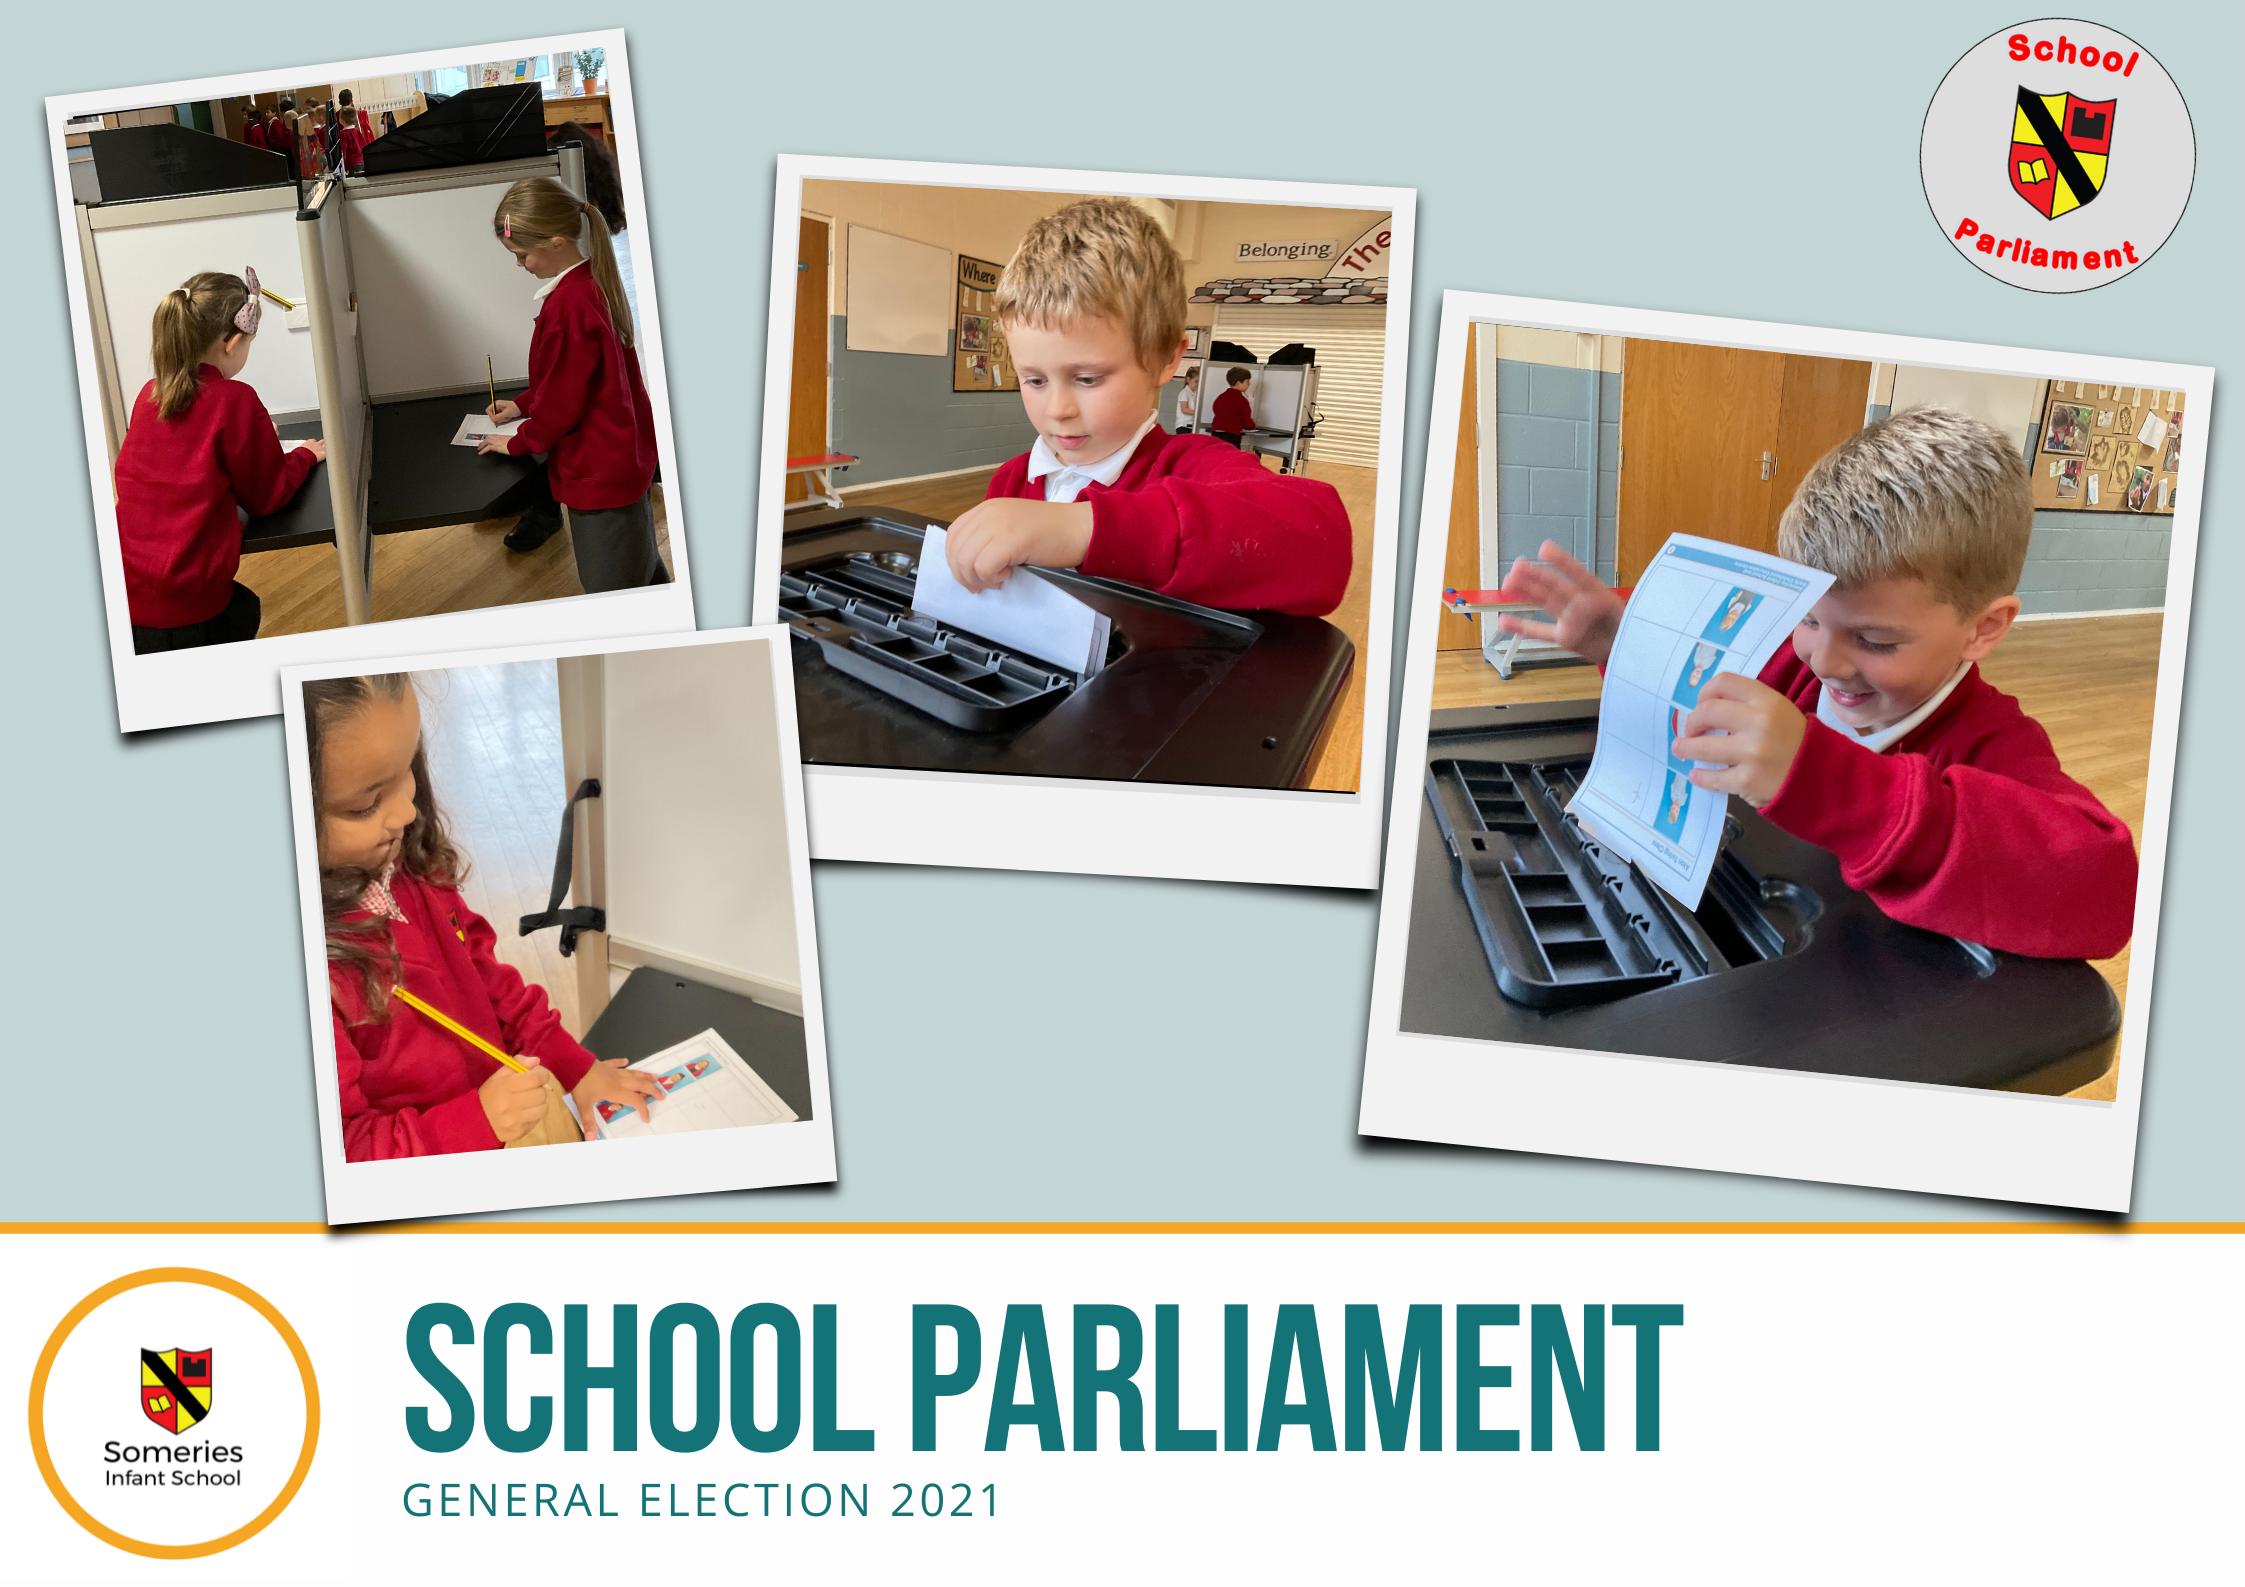 School Parliament